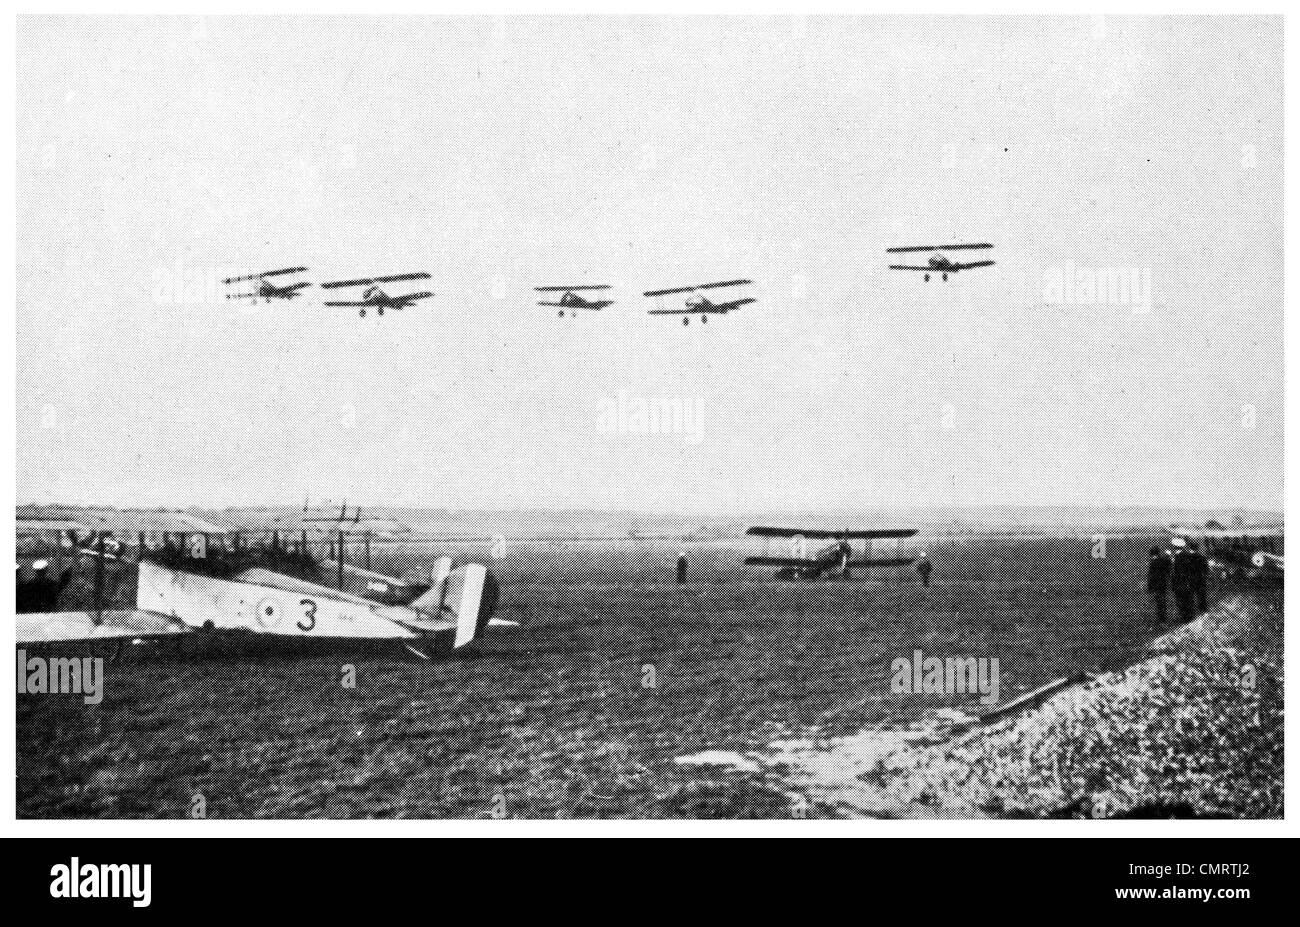 1918 Camel Plane RAF over British Aerodrome Royal Air Force Corps Service - Stock Image